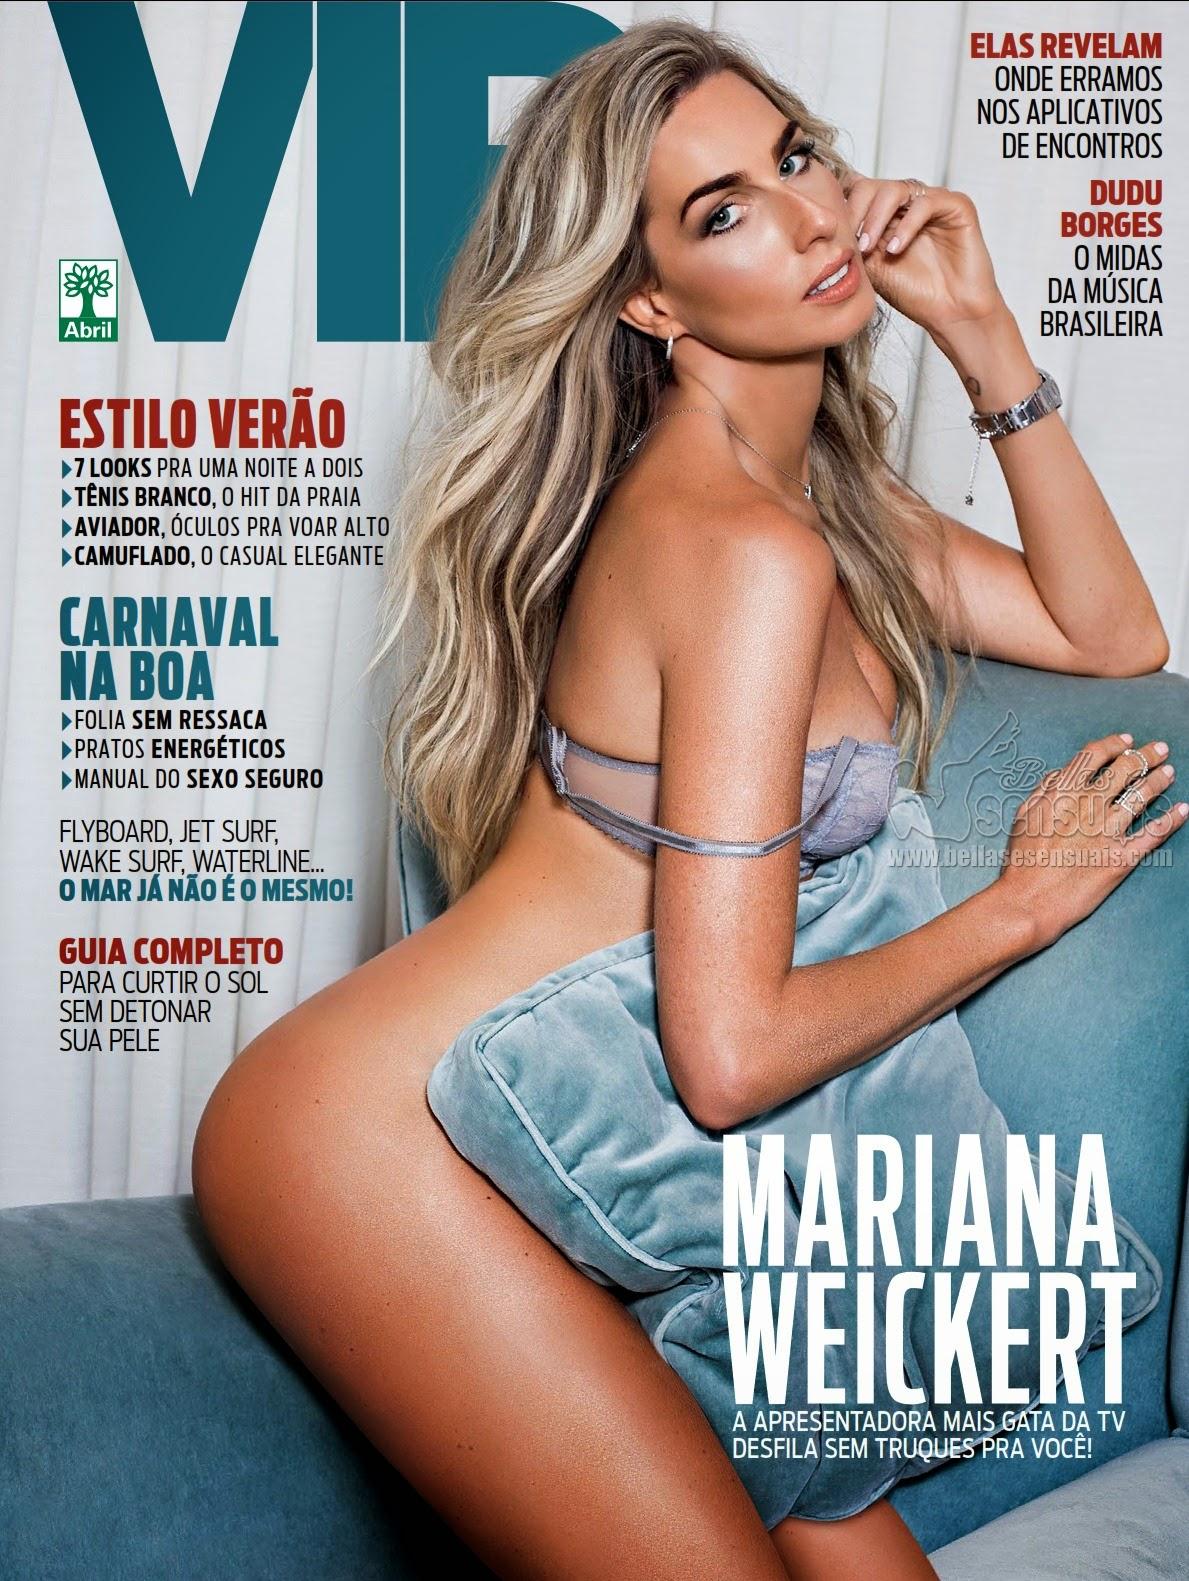 Revista Vip Mariana Weickert Fevereiro De